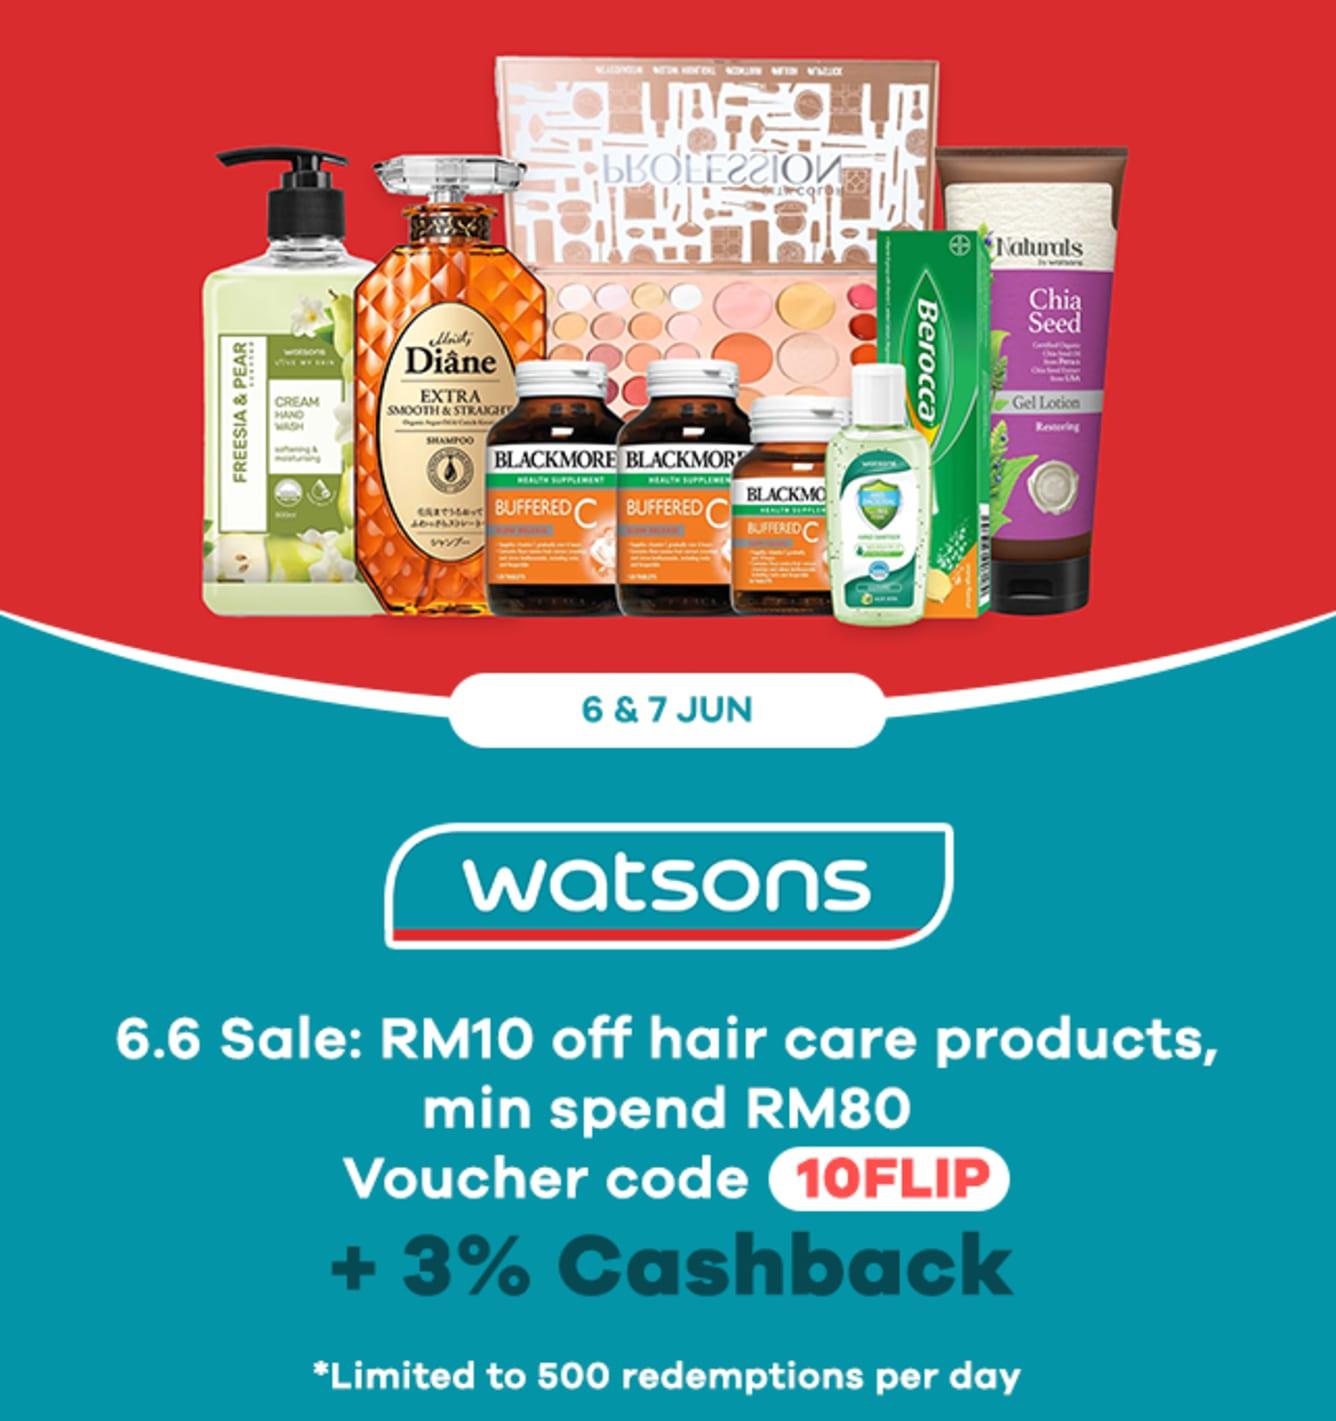 Watsons Weekly Upsized Cashback